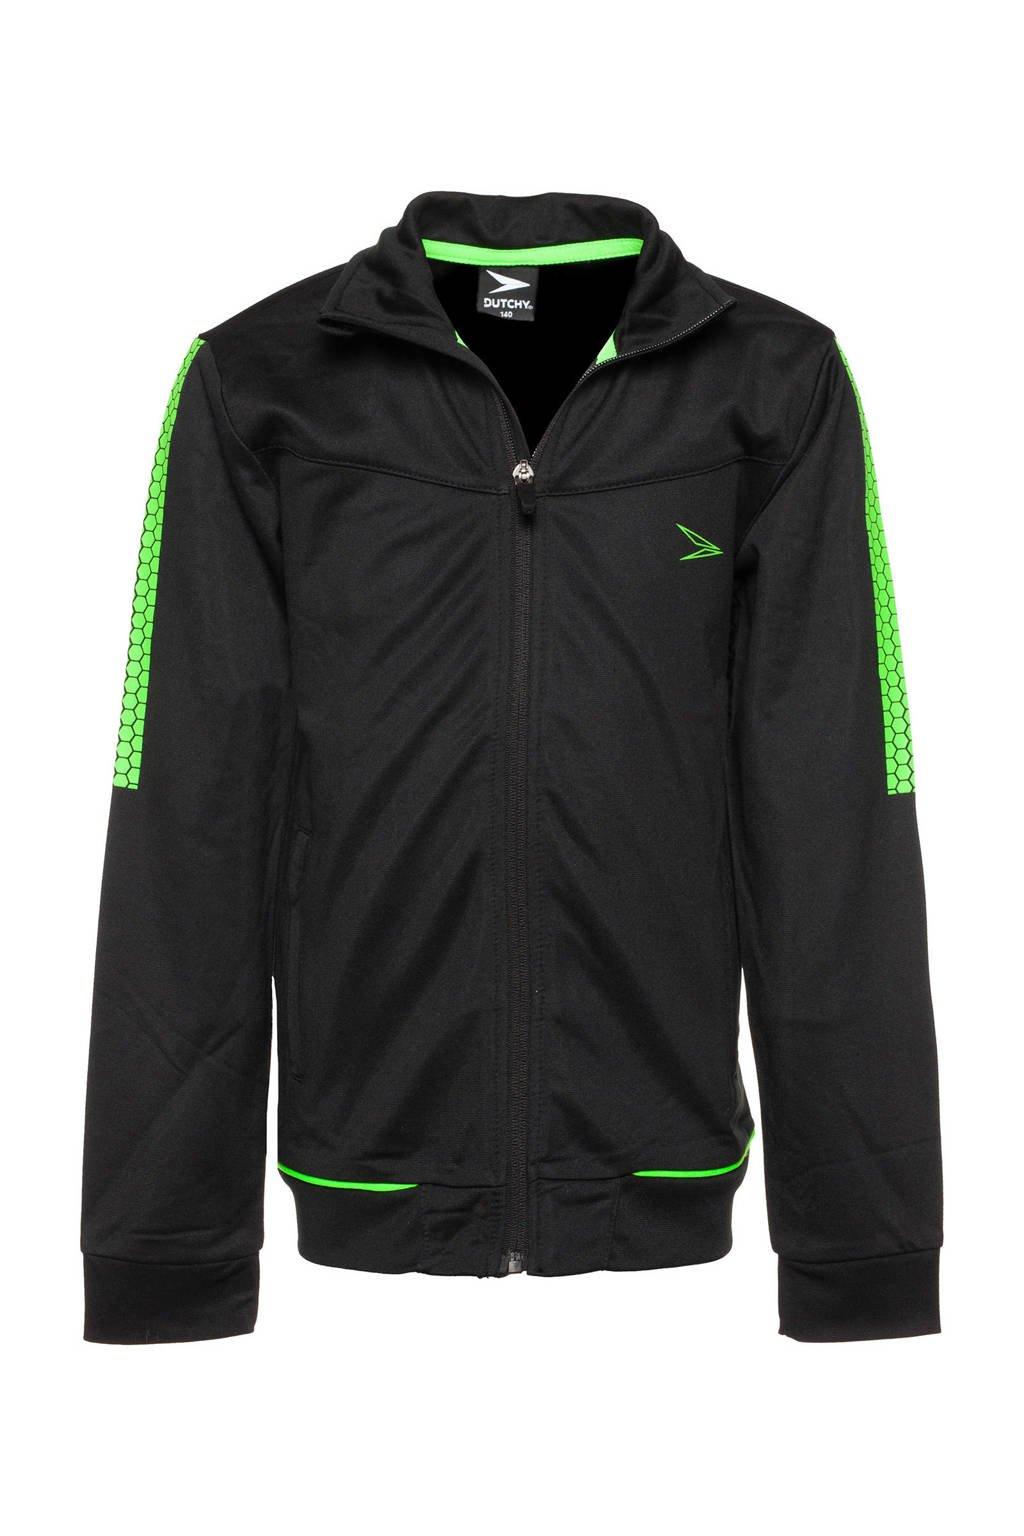 Scapino Dutchy   trainingsjack zwart, Zwart/groen